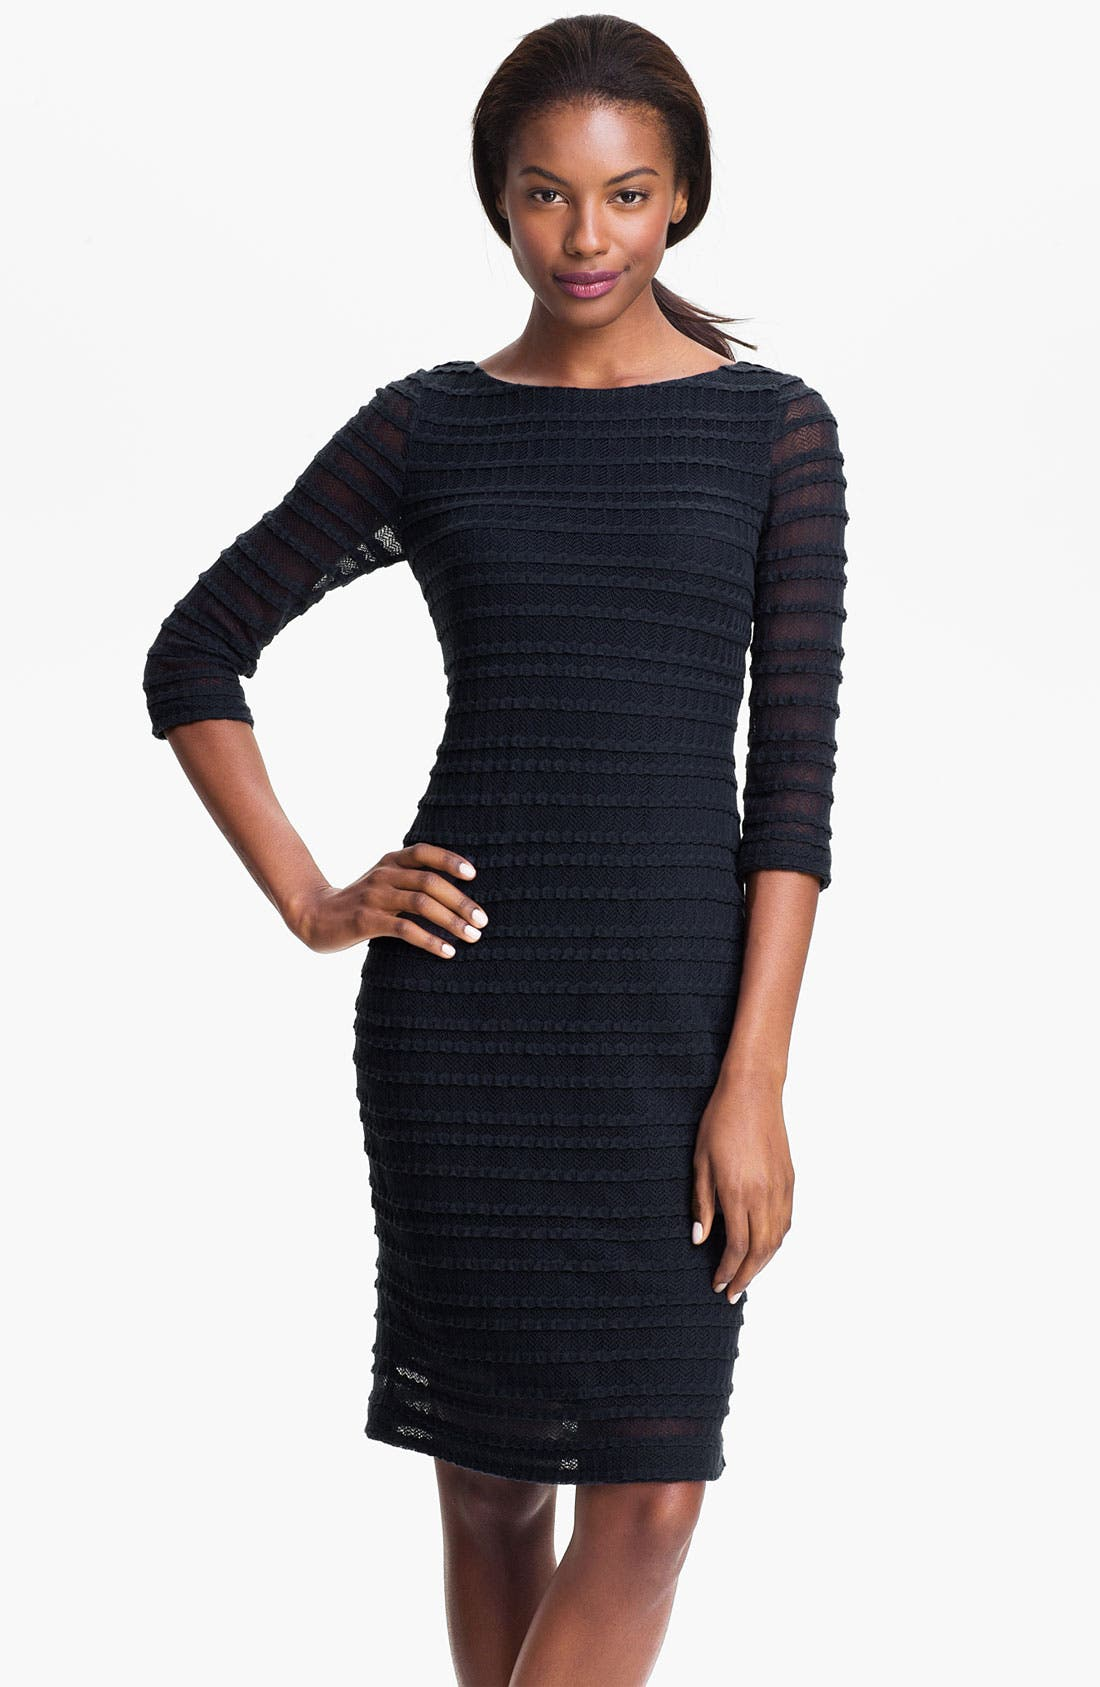 Alternate Image 1 Selected - Kay Unger Illusion Sleeve Textured Sheath Dress